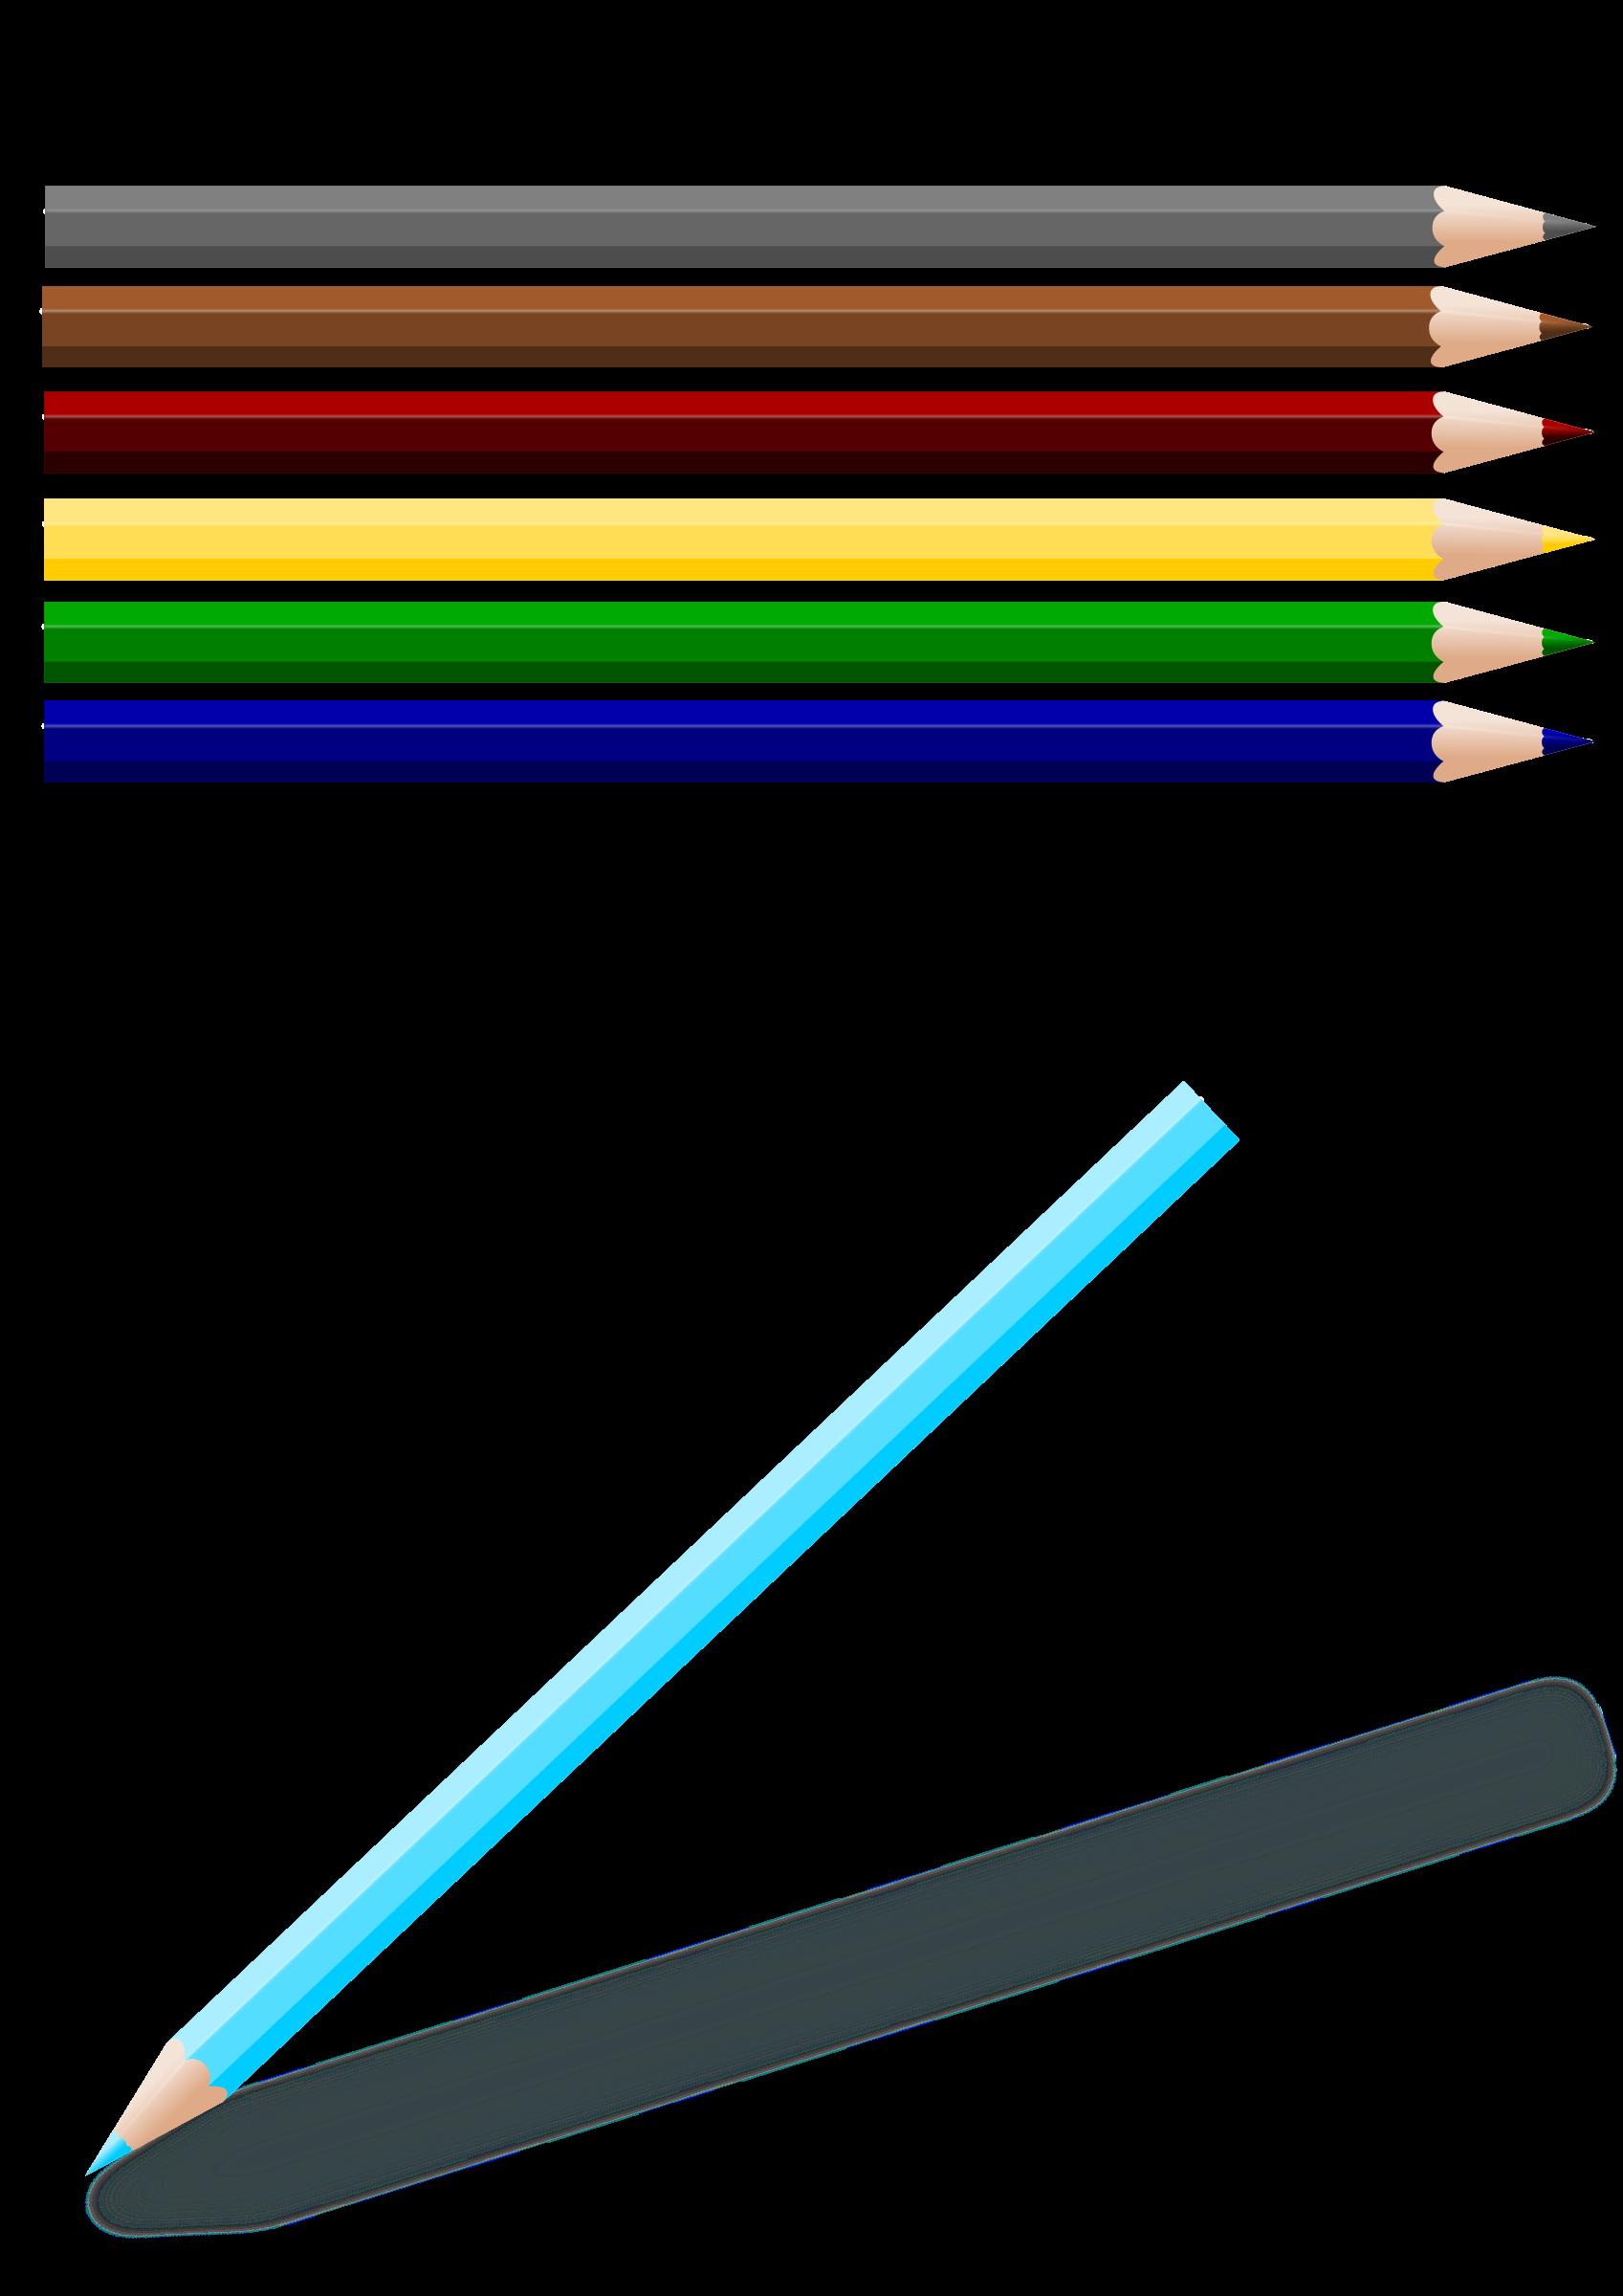 Pencil clipart colouring pencil. Colored pencils big image